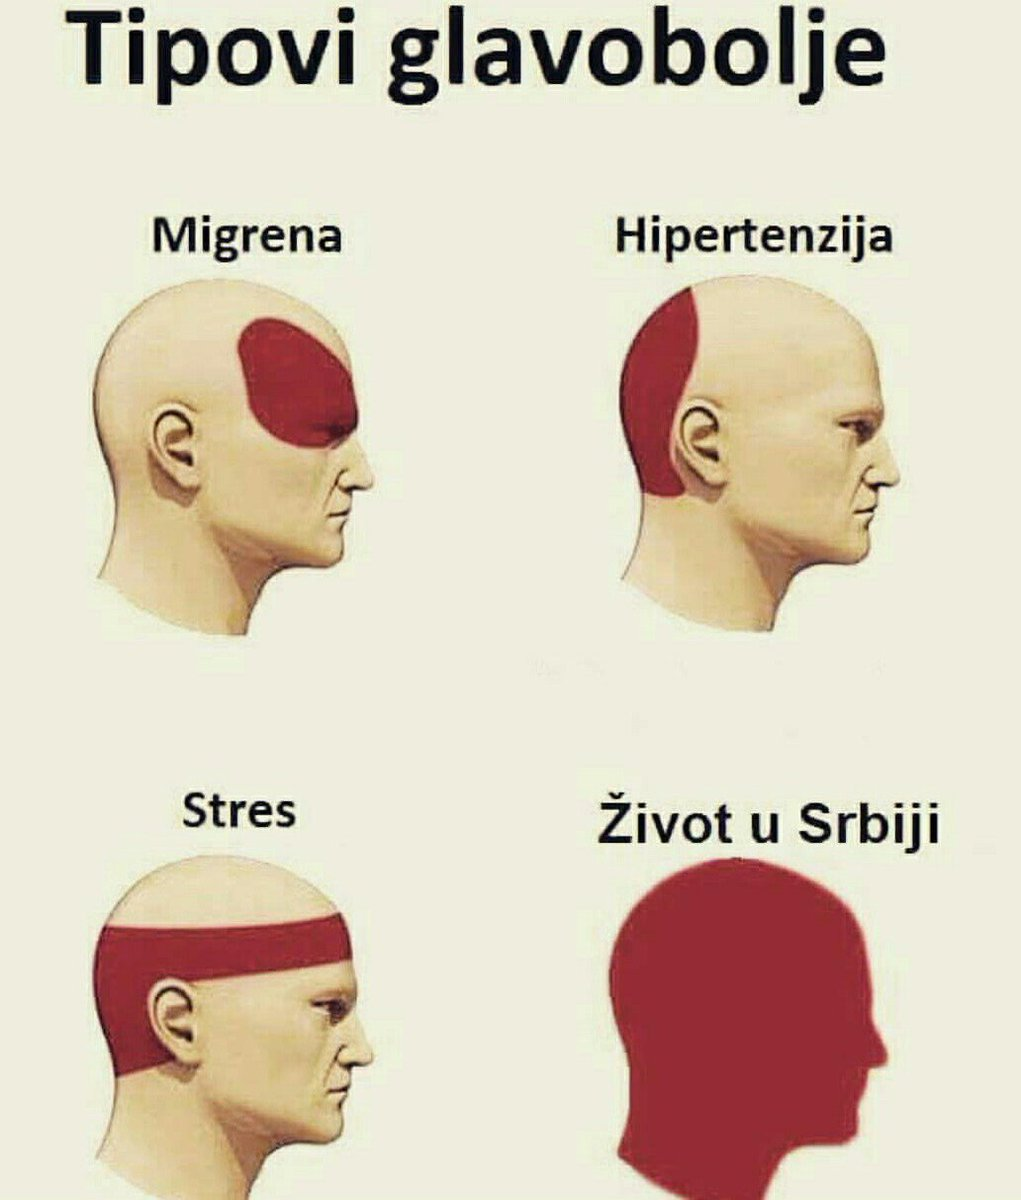 kronična hipertenzija i glavobolja)